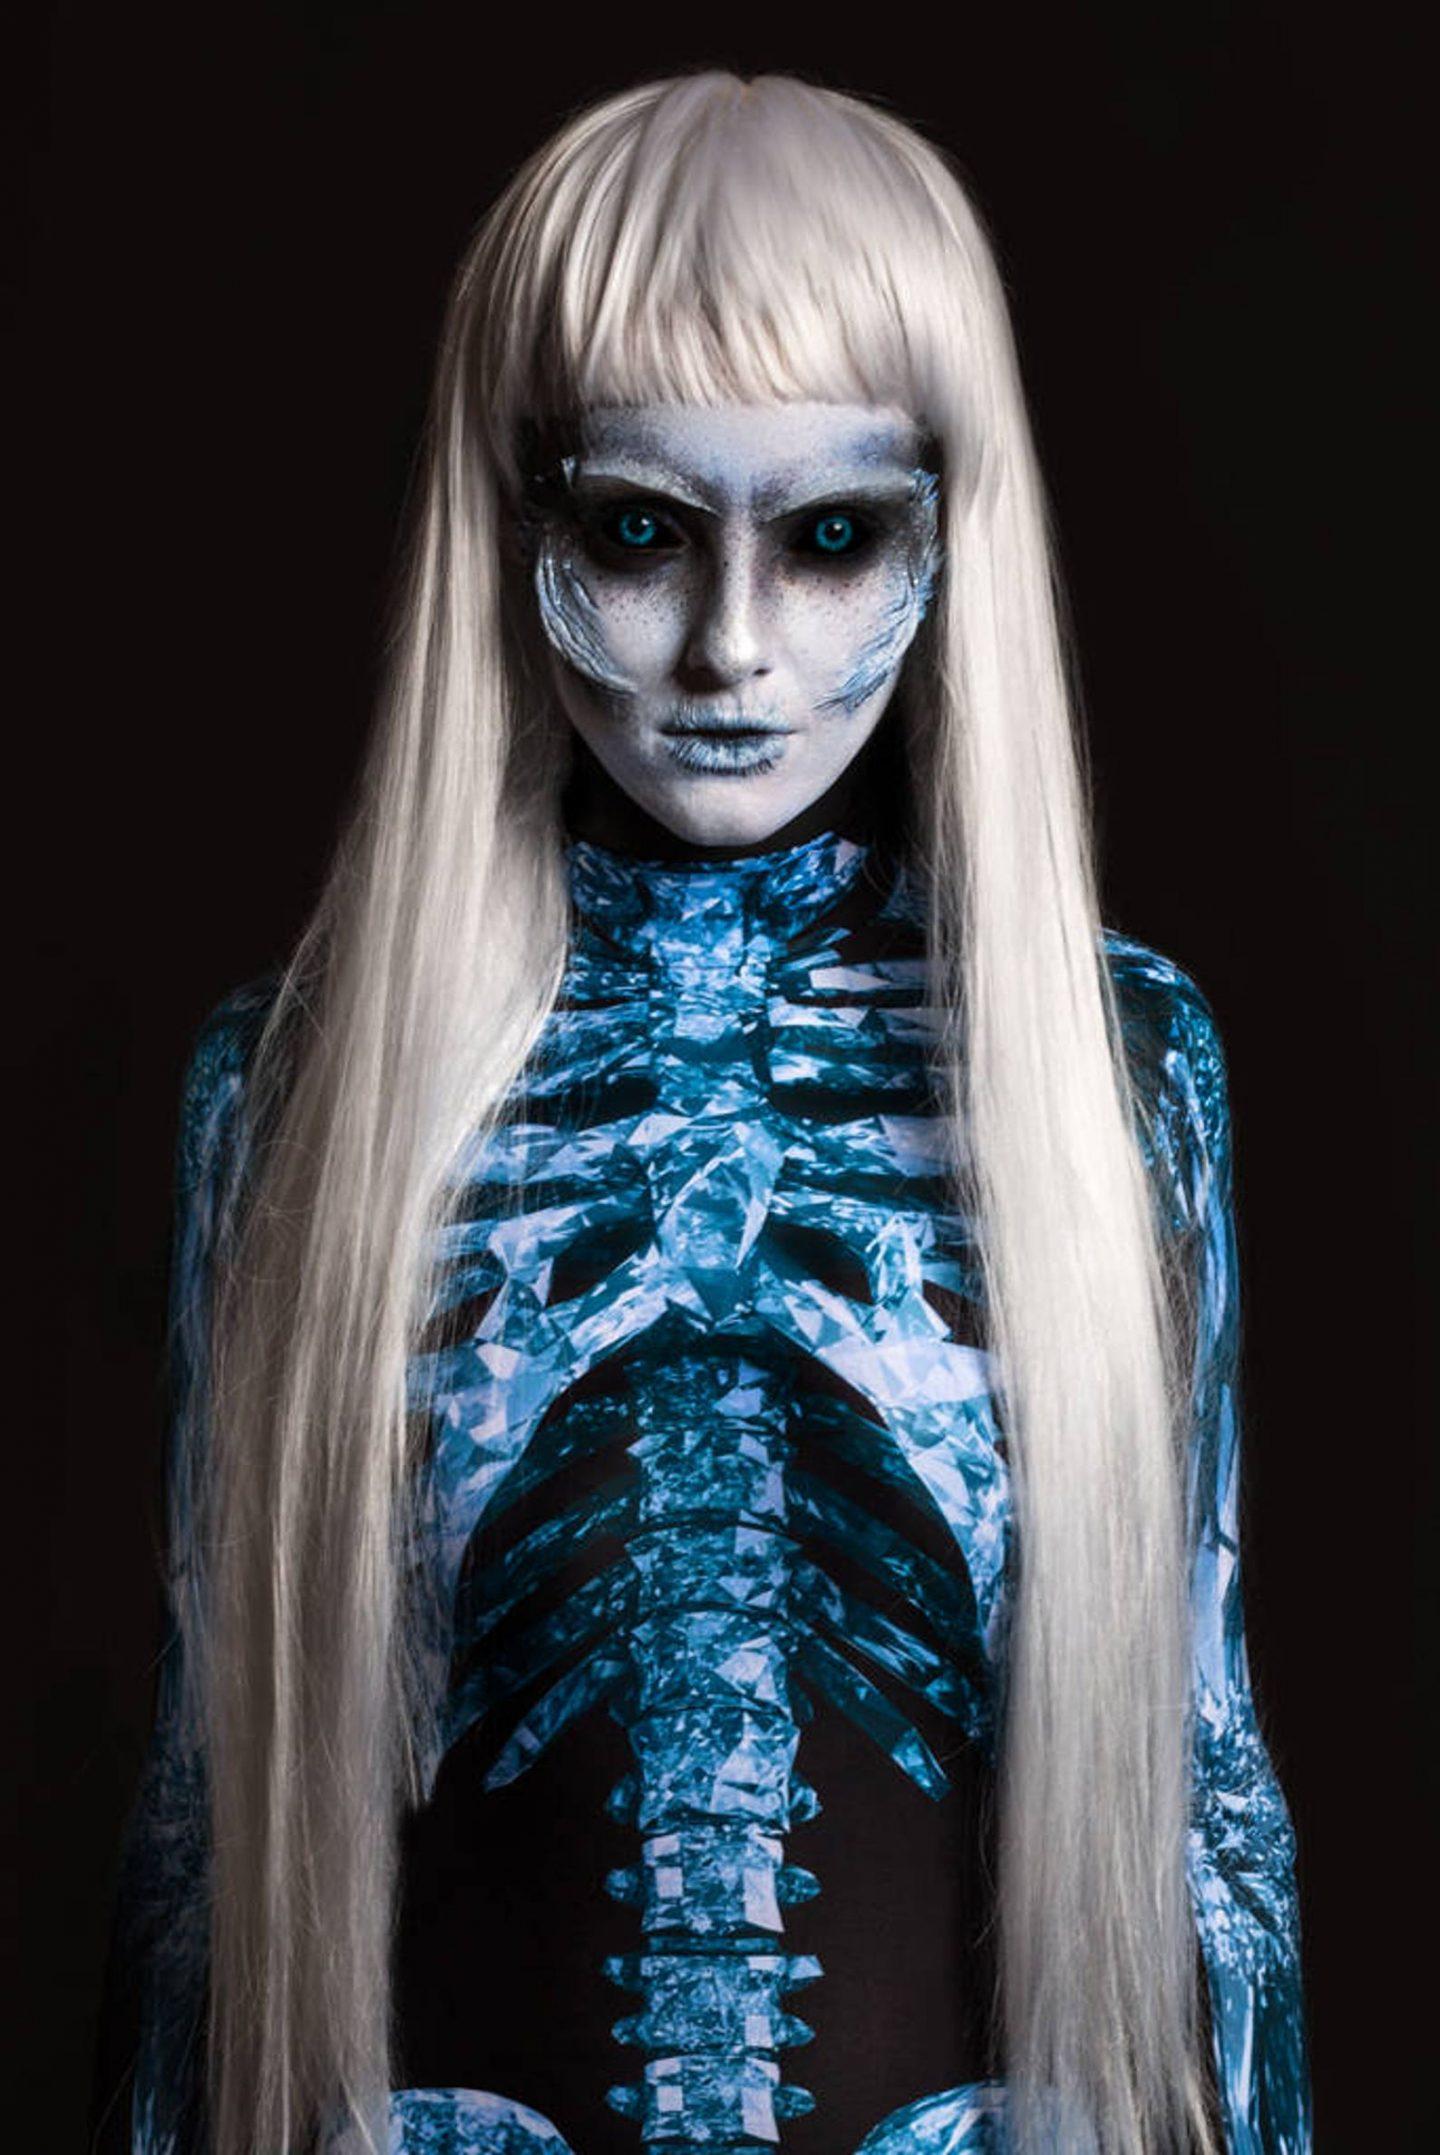 Scary Game Of Thrones skeleton Halloween costume